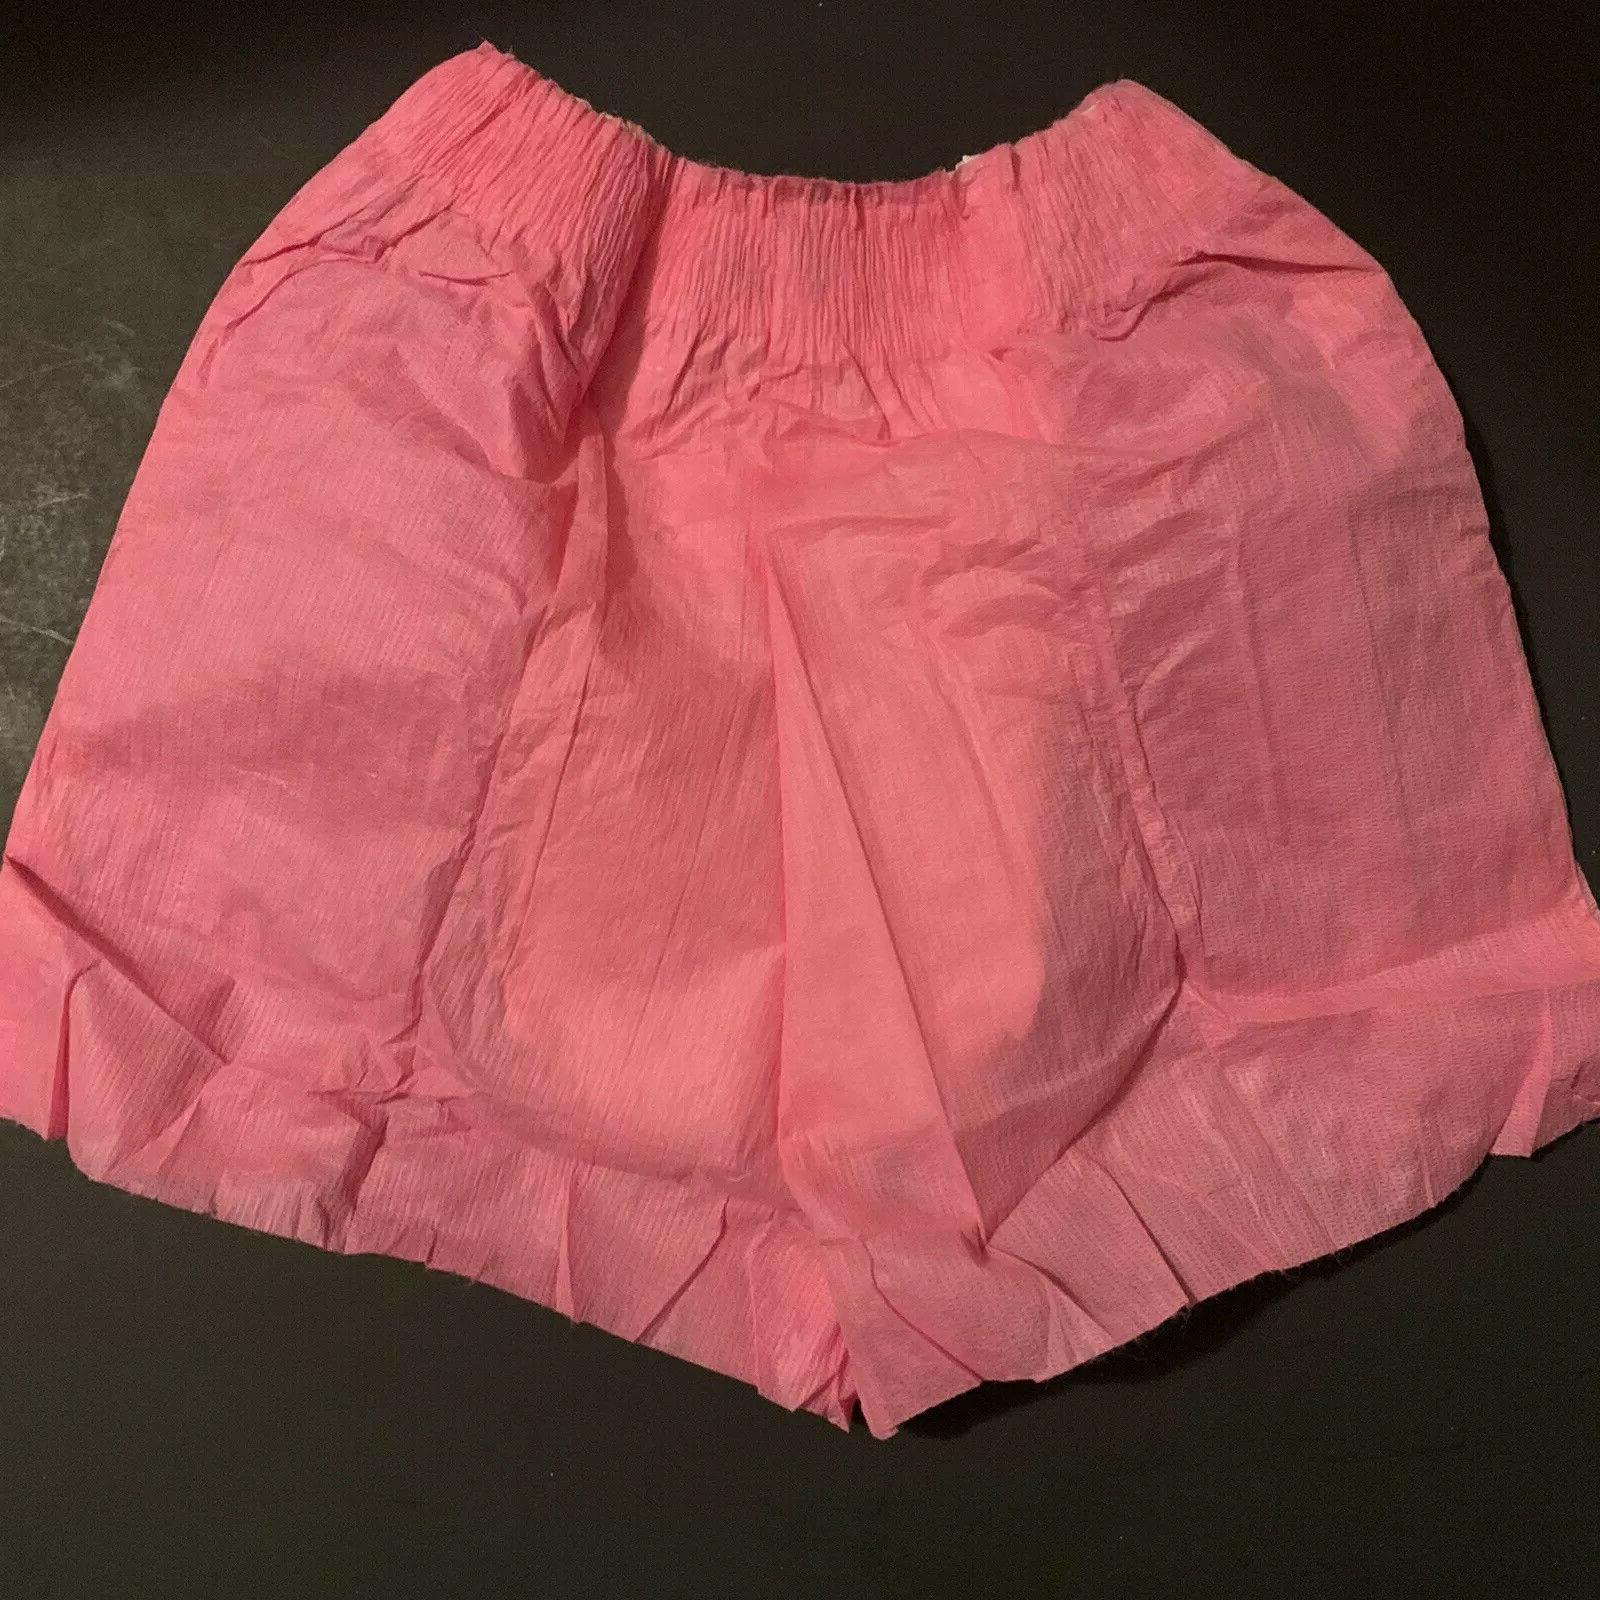 1 Goodnites Girls Diaper Sleep Shorts size Pic